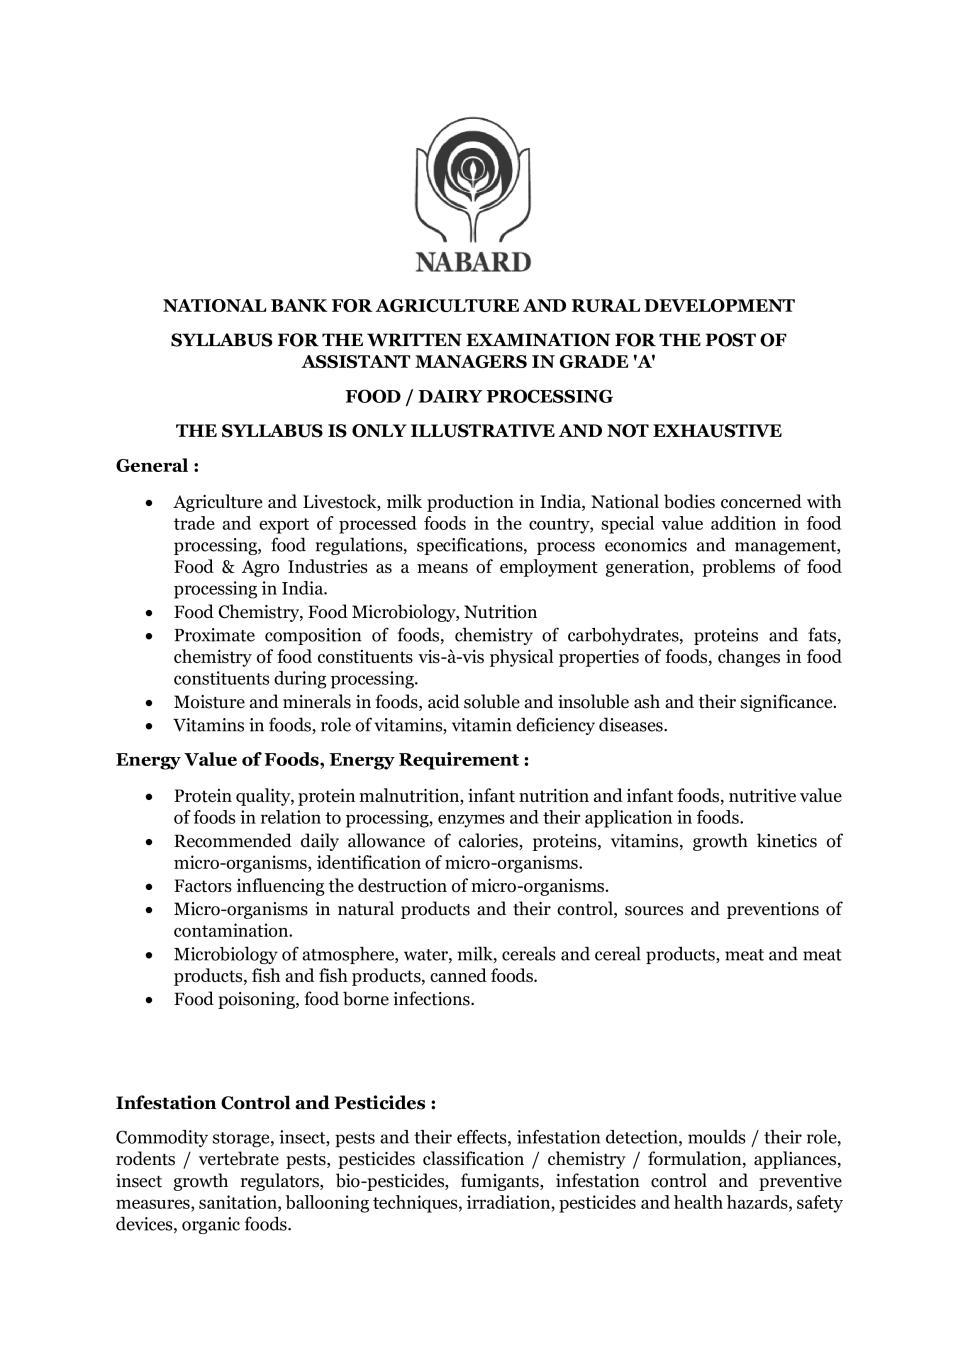 NABARD Grade A Syllabus 2020 Food Dairy Processing - Page 1